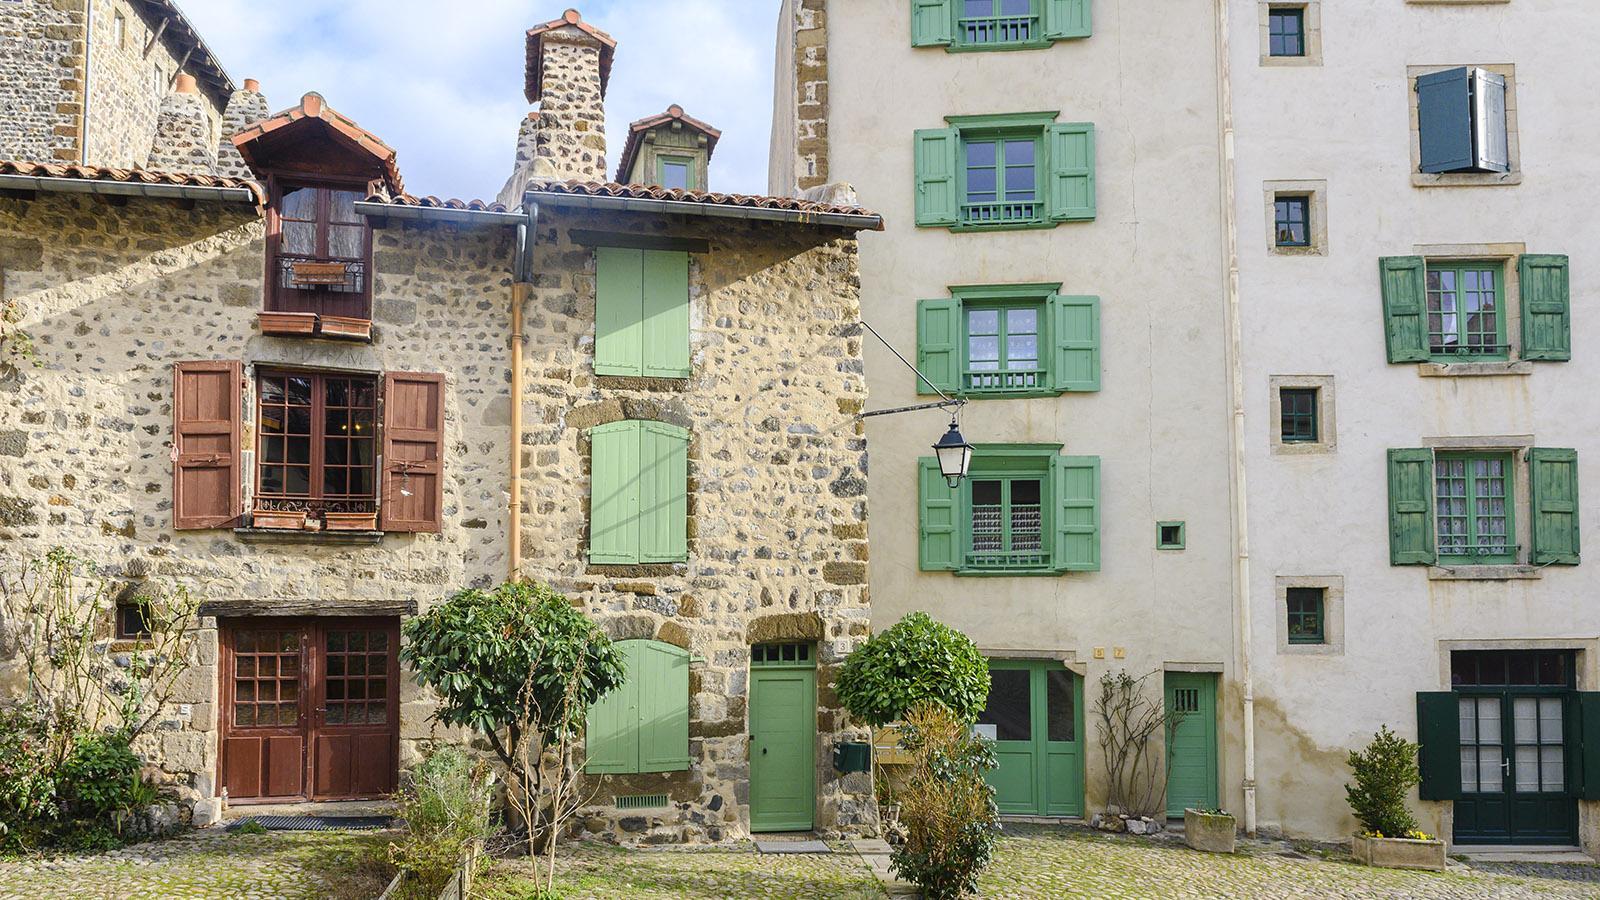 Charmanter Stadtplatz im alten Zenturm von Le Puy-en-Velay. Foto: Hilke Maunder